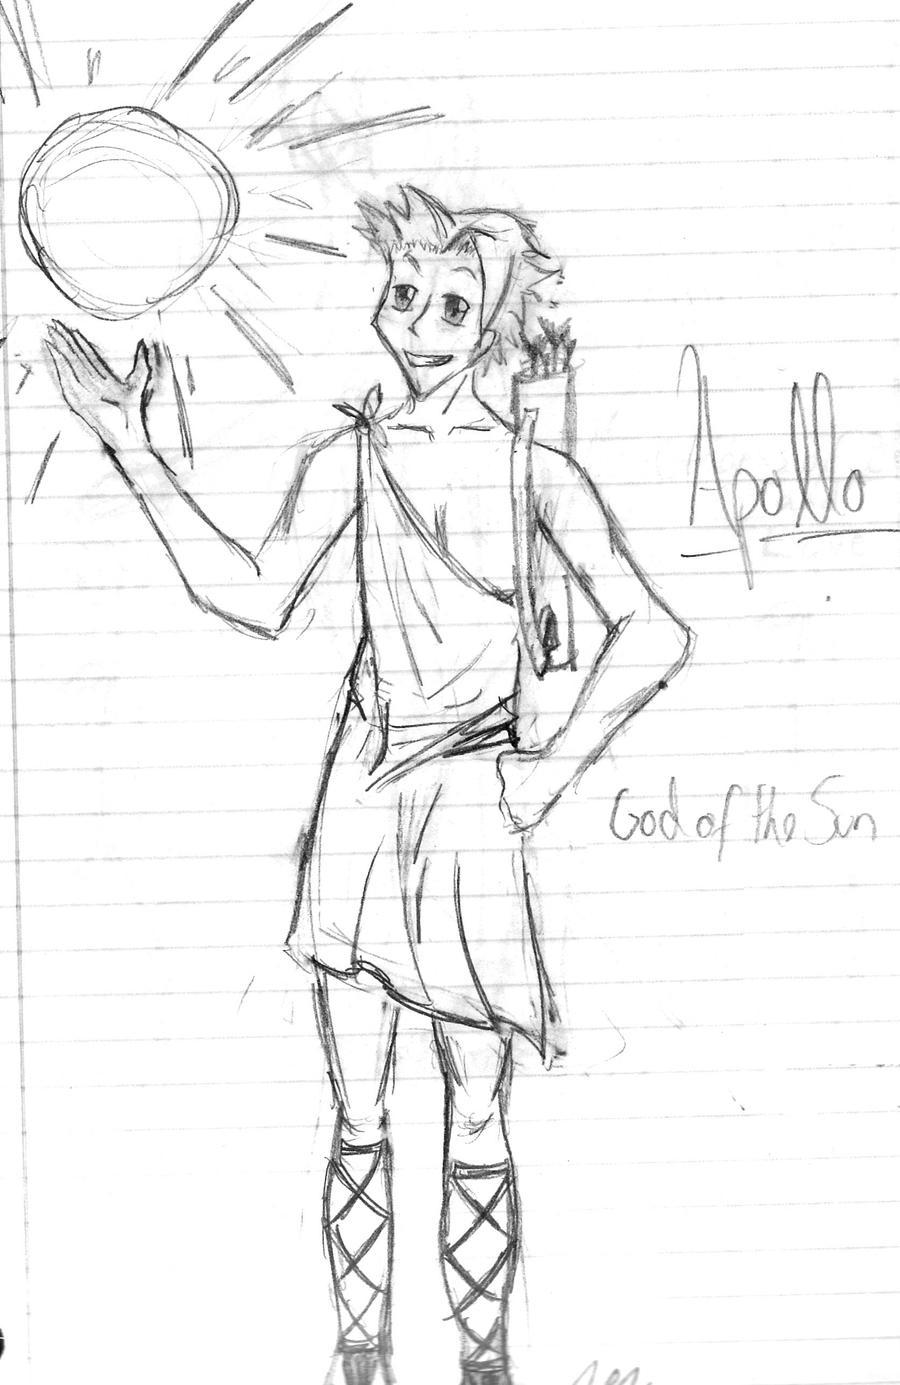 apollo drawing - photo #4